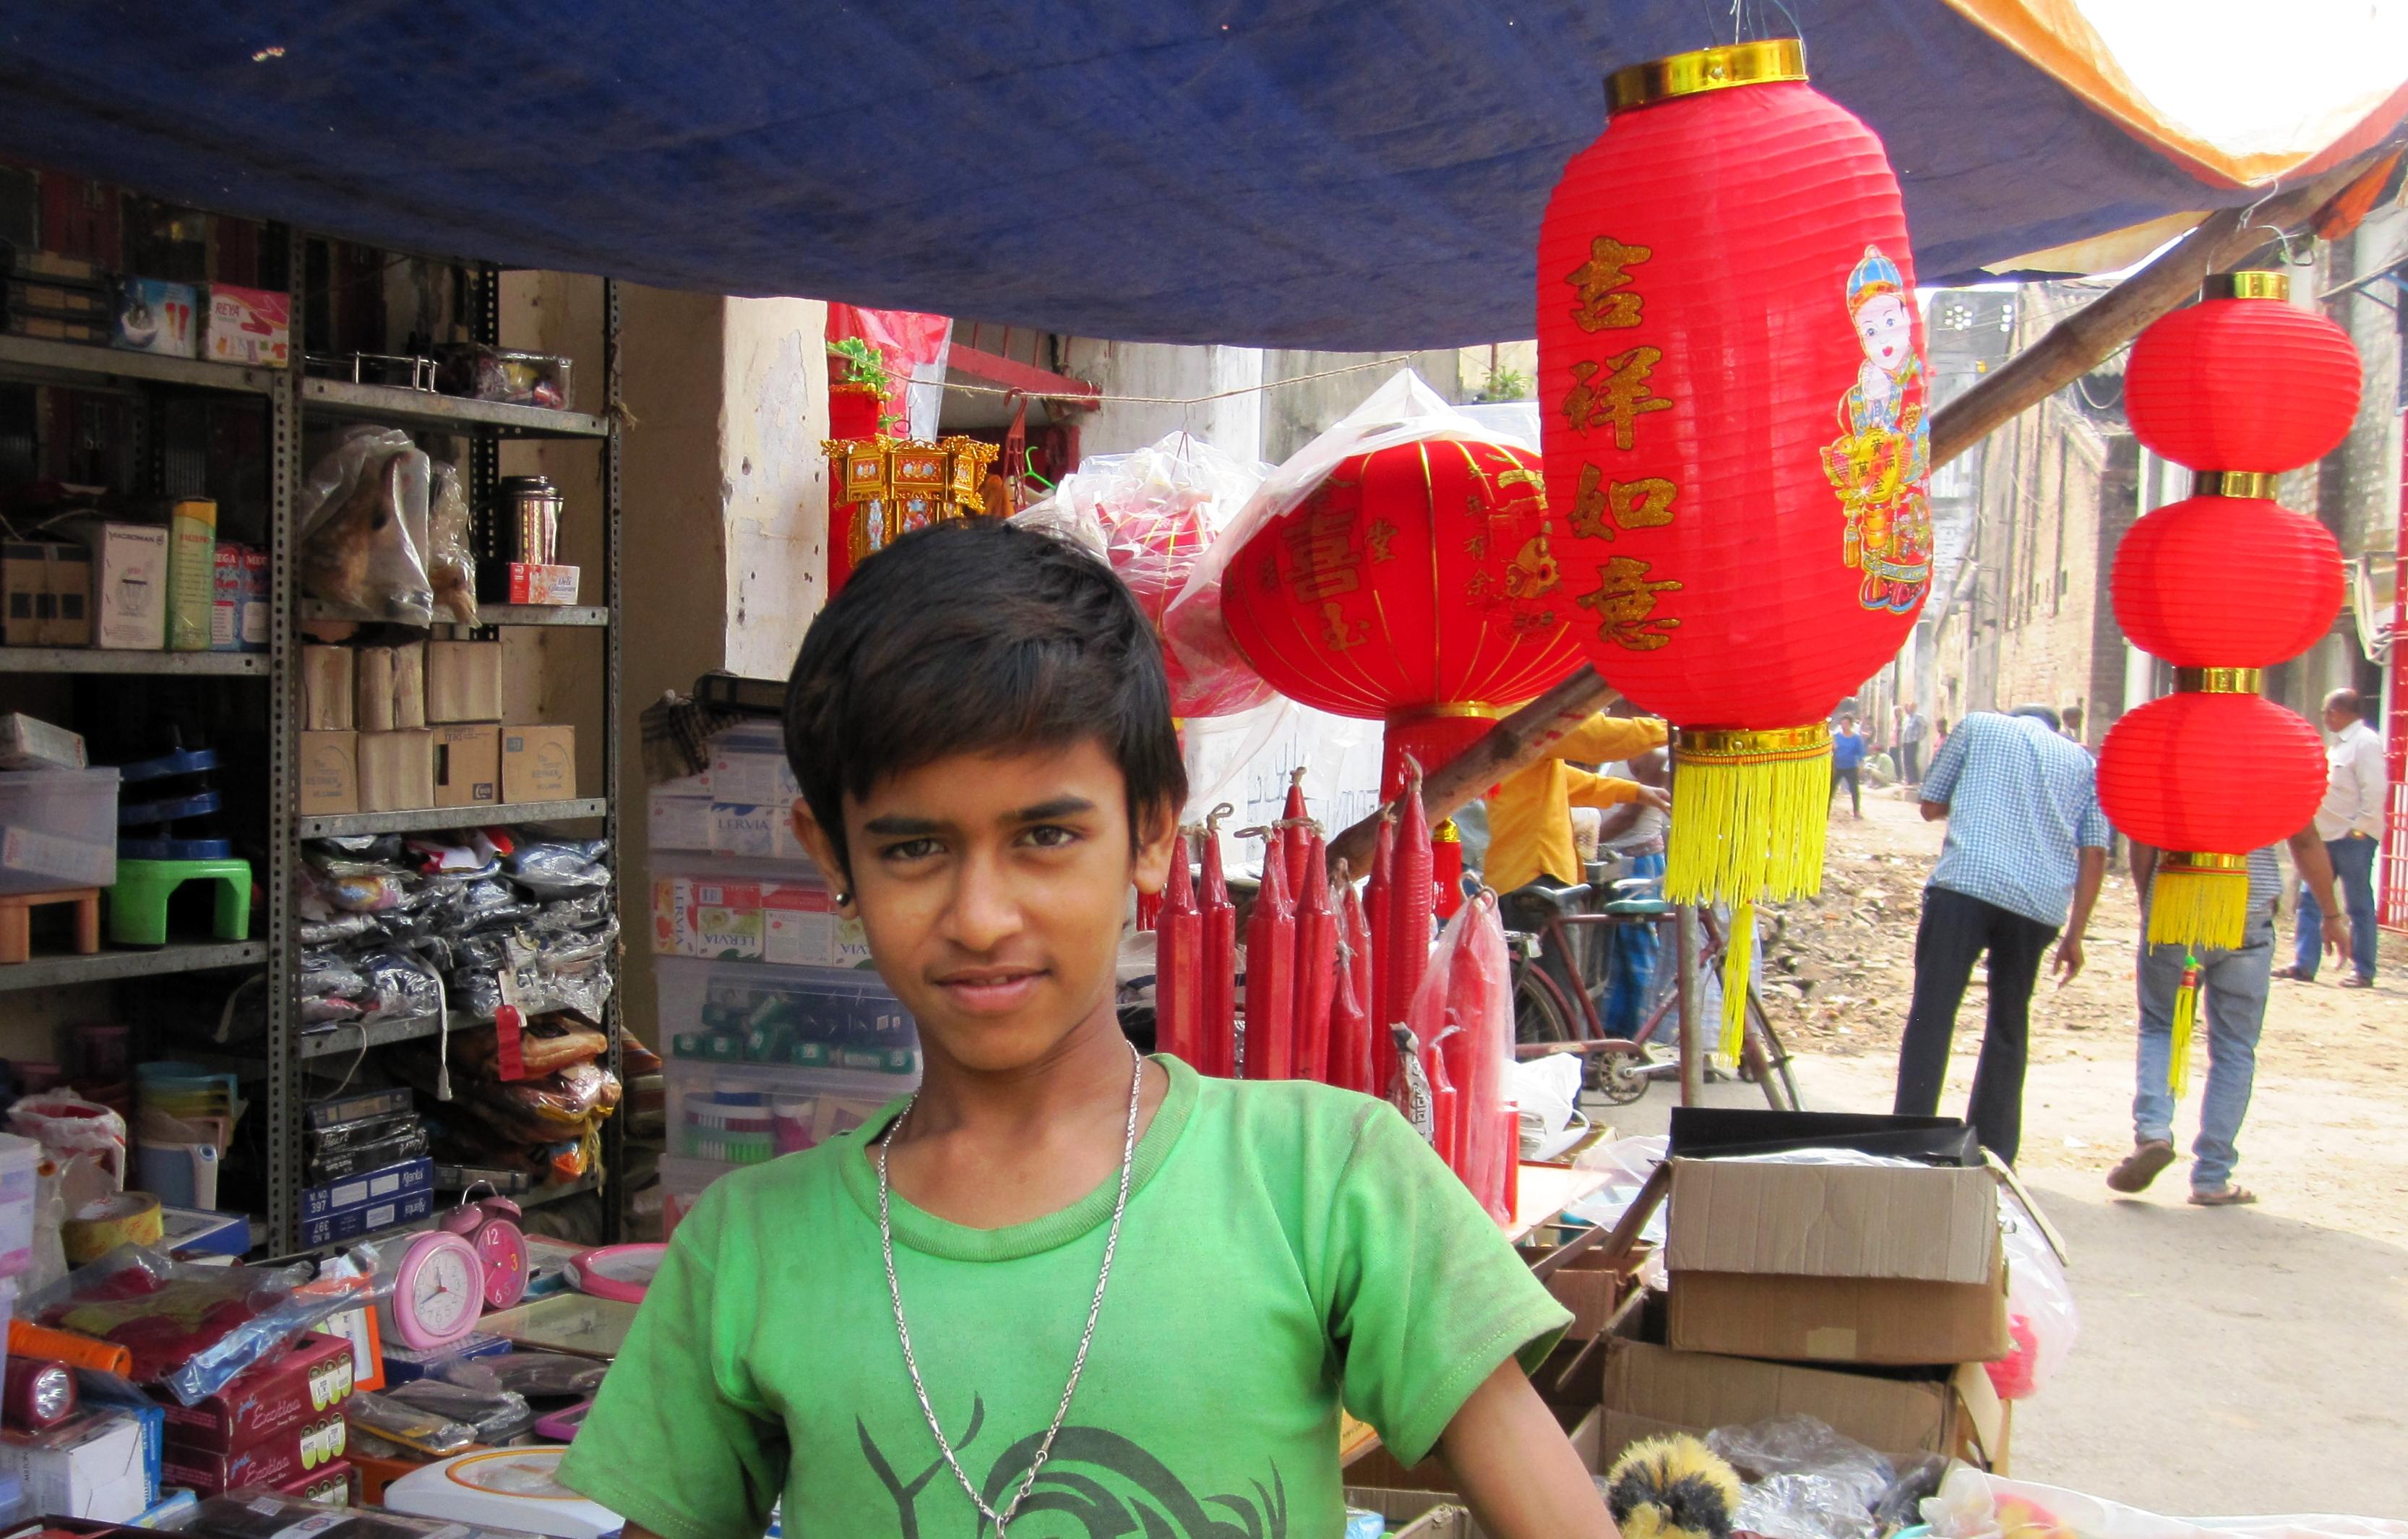 Indisk pojke i Tangra säljer kinesiska lampor. ©Zac O'Yeah